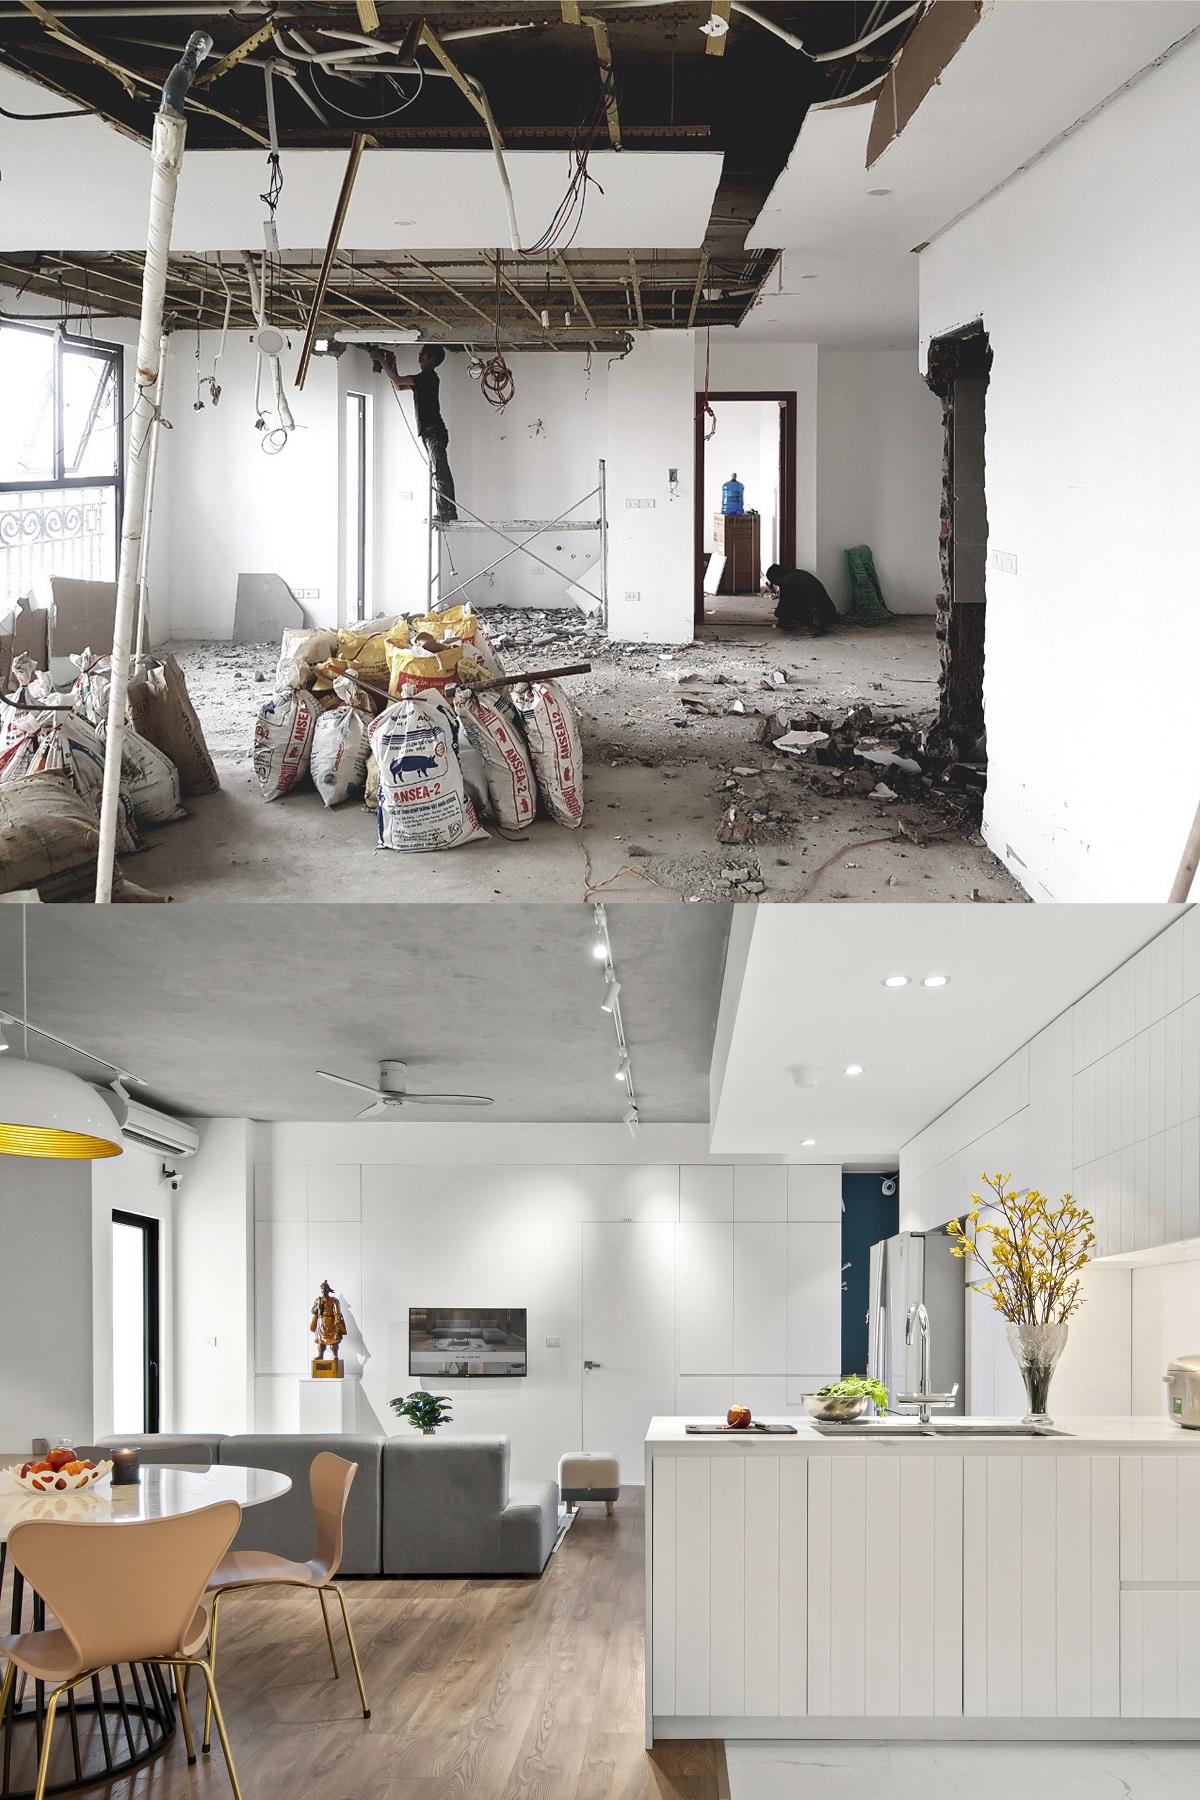 kienviet-the-emerald-apartment-to-am-toi-uu-ve-cong-nang-sma-studio